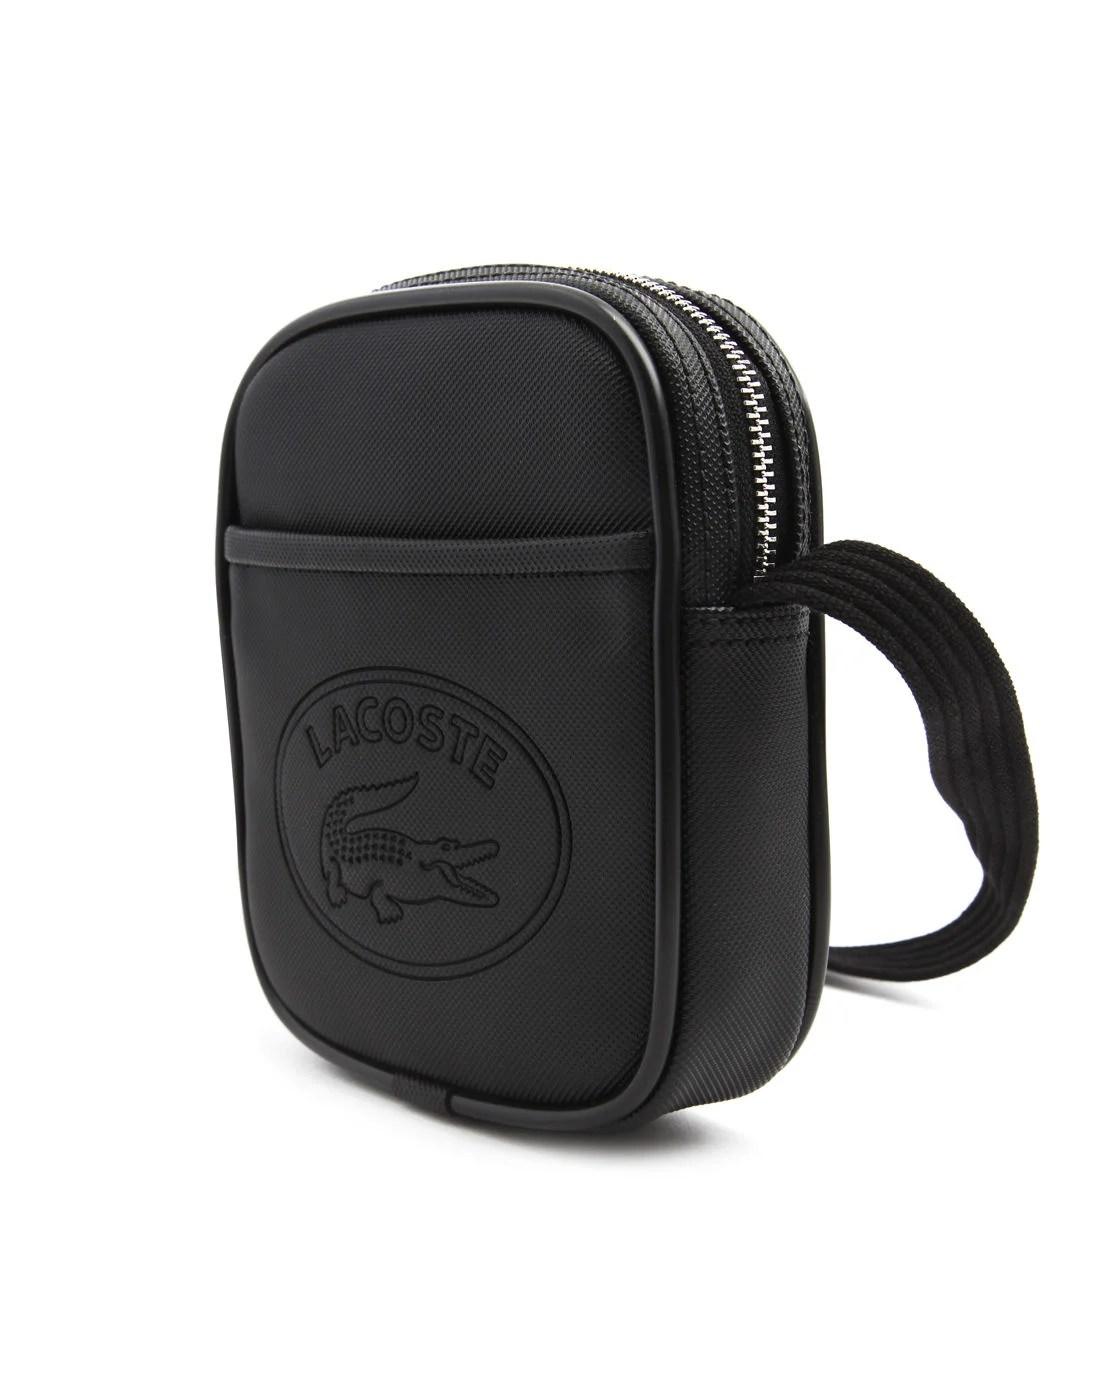 Lacoste Black Pvc Small Bag In Black For Men Lyst